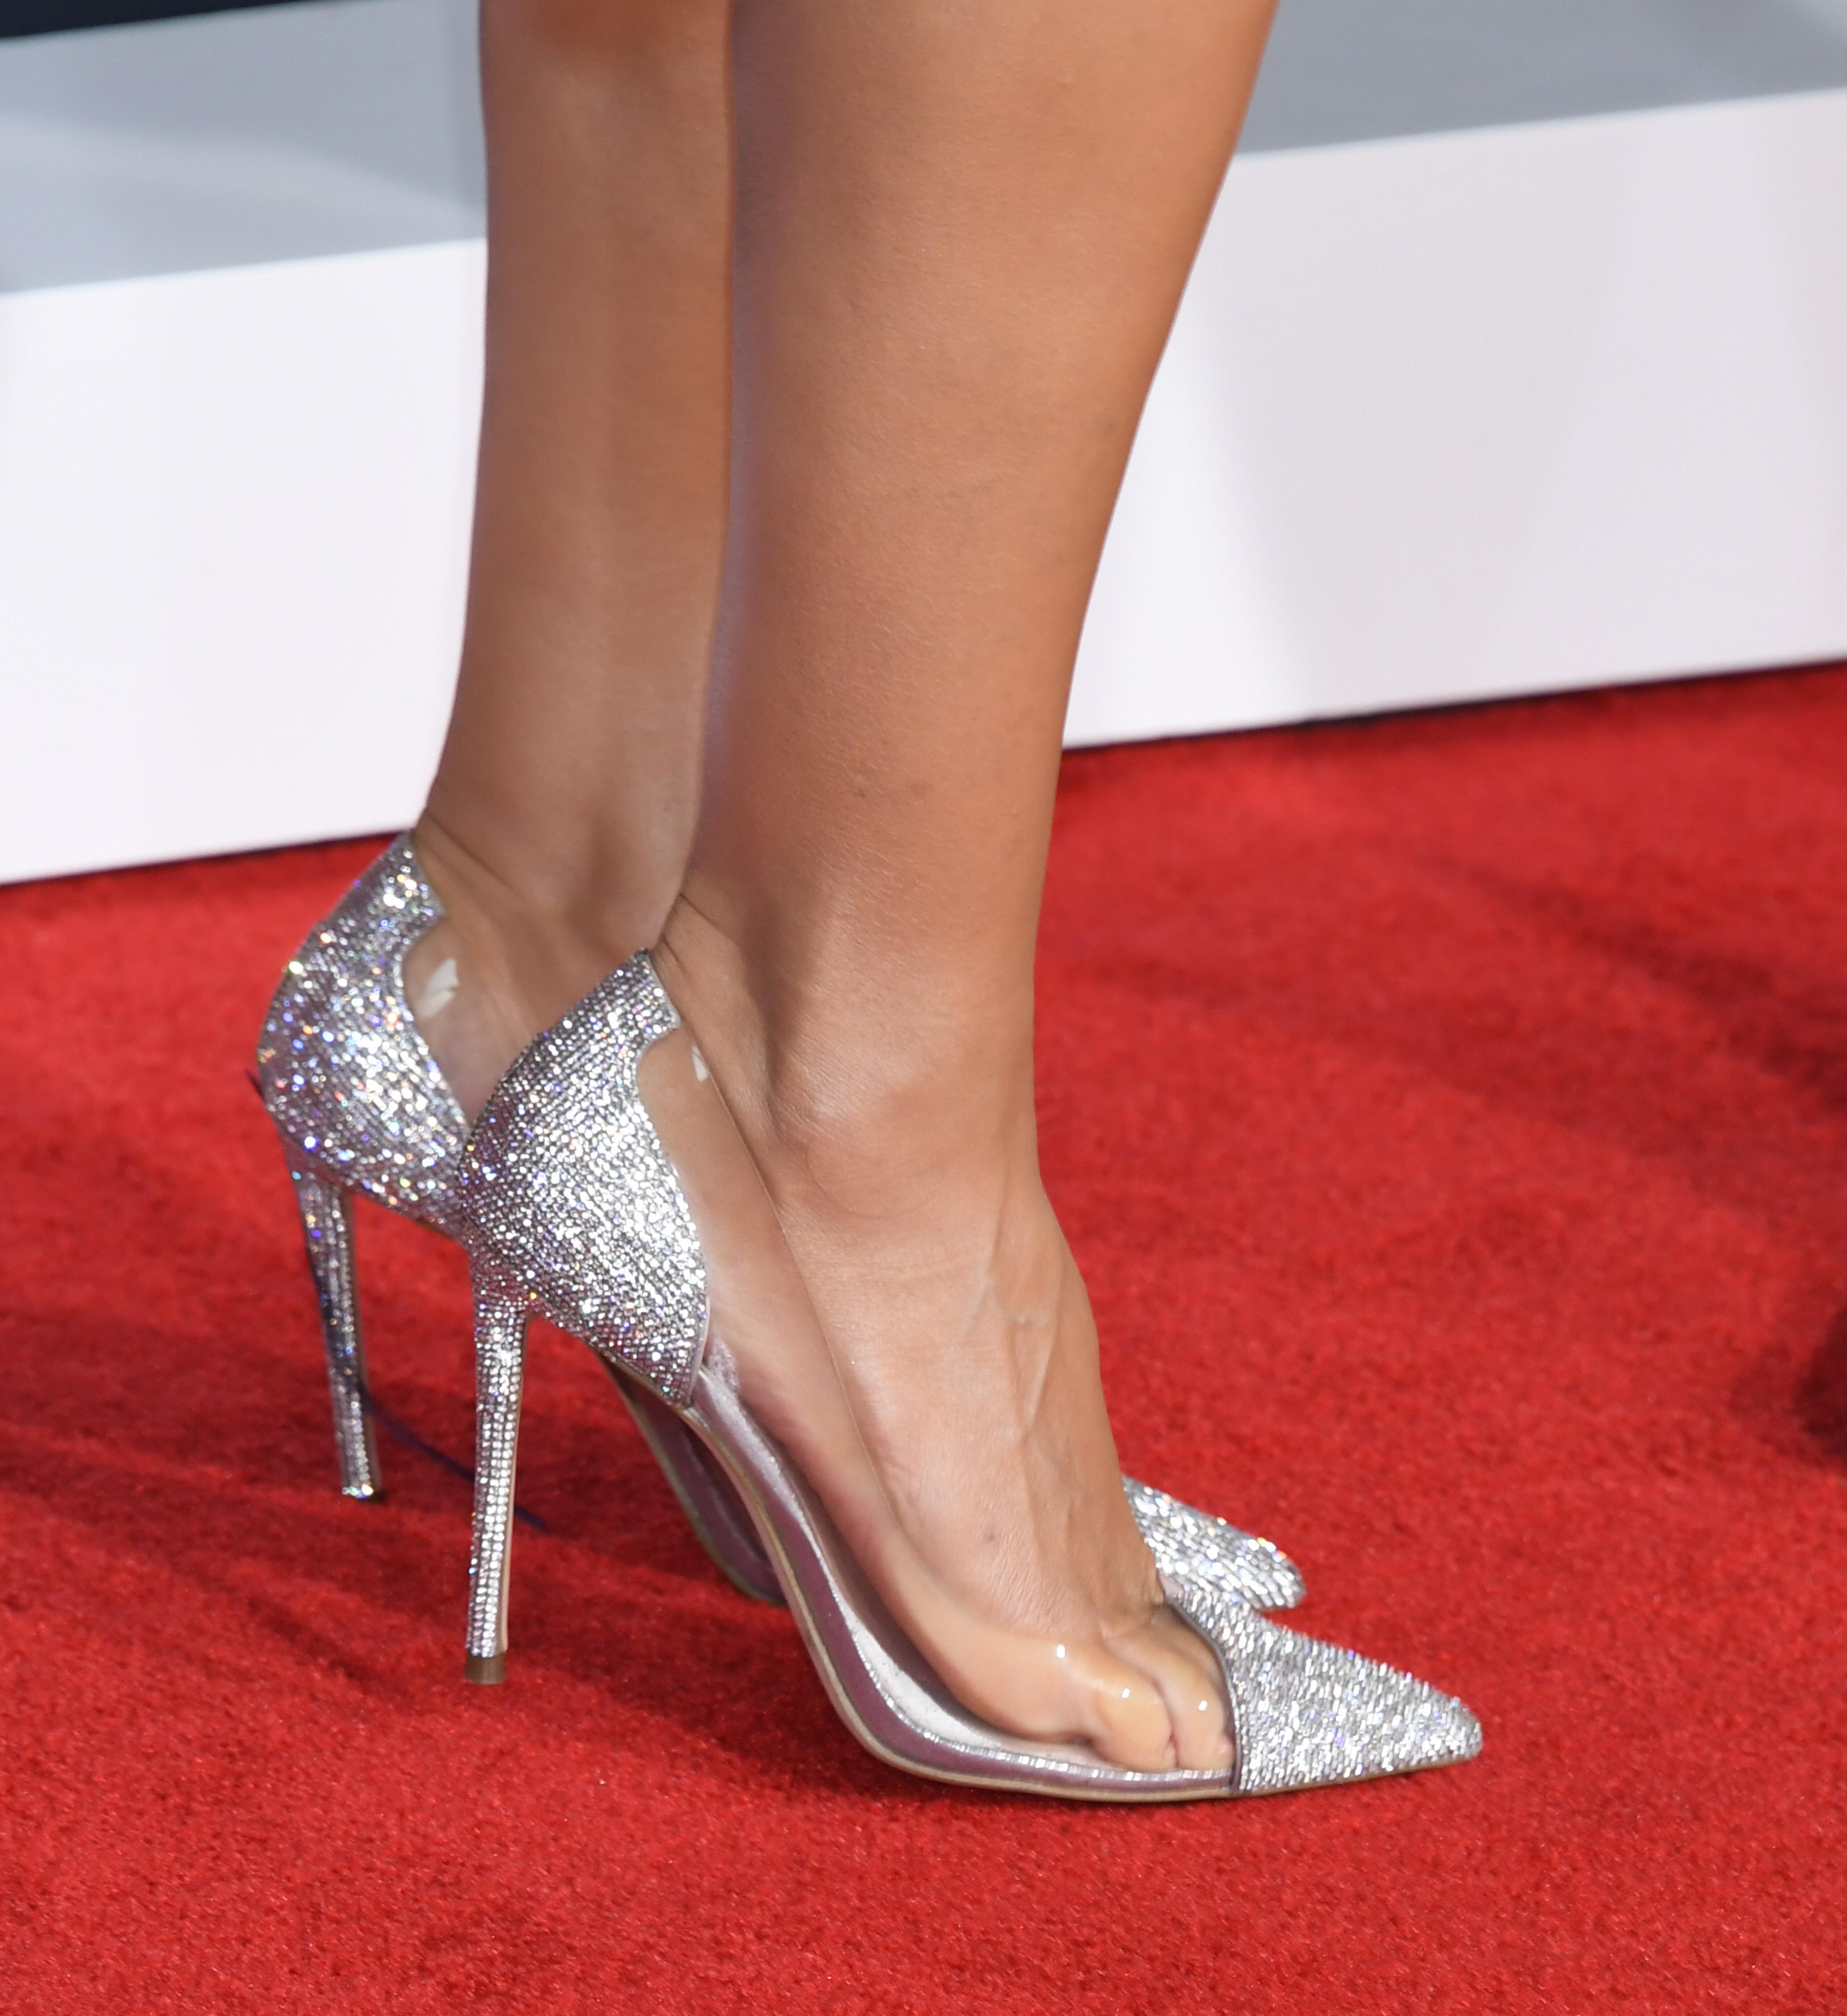 Heidi Klums Feet